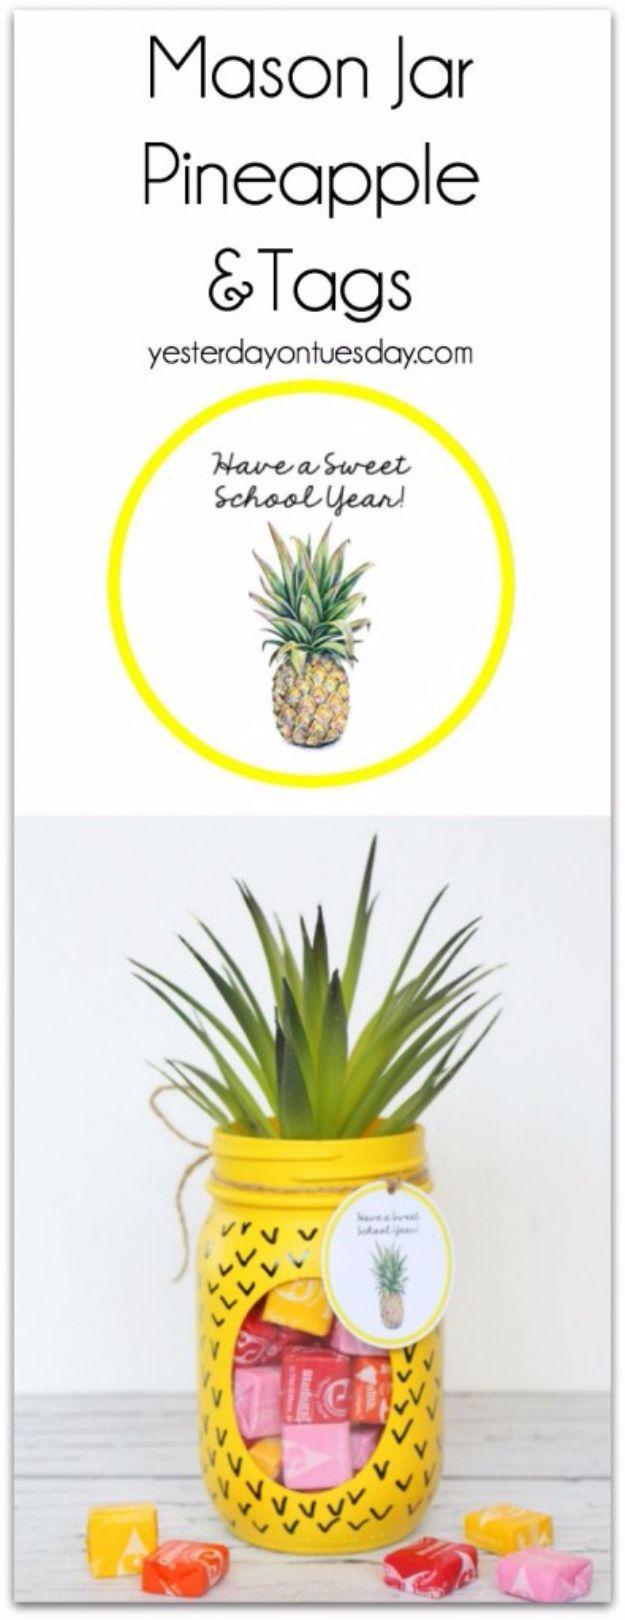 Free Printables for Mason Jars - Mason Jar Pineapple And Tags - Best Ideas for Tags and Printable Clip Art for Fun Mason Jar Gifts and Organization#masonjar #crafts #printables